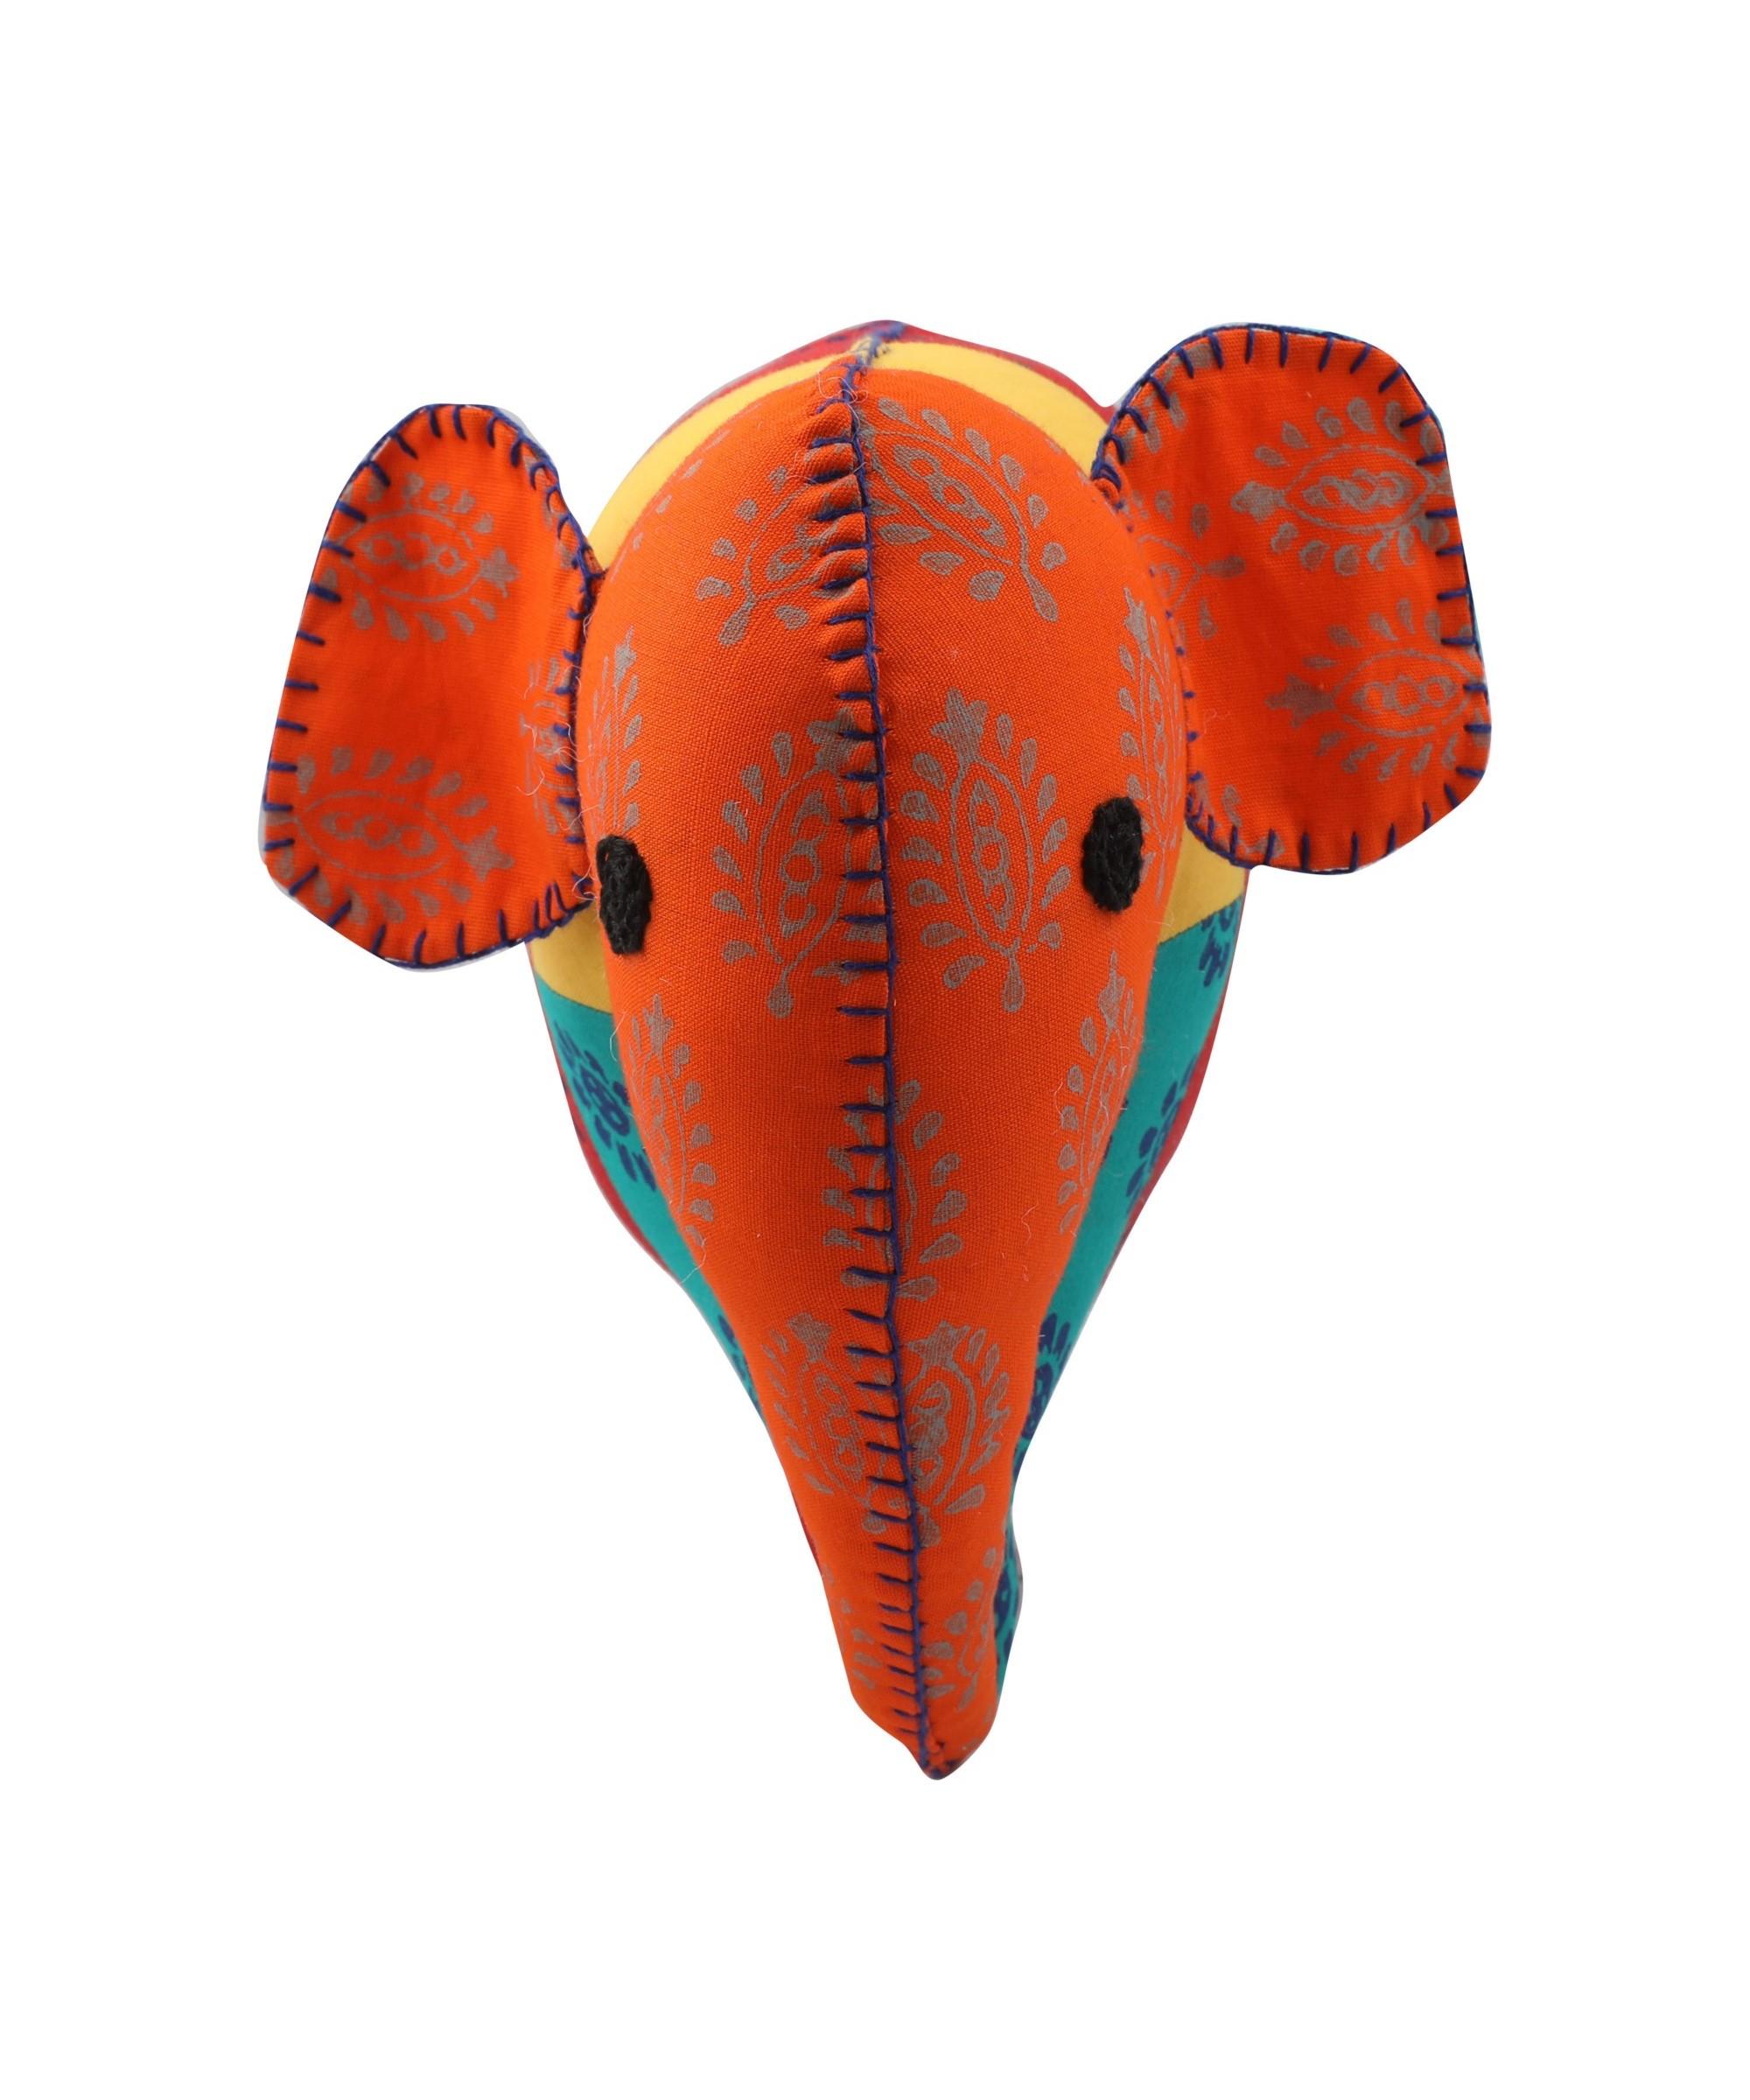 Elephant - Patchwork Soft Toy Slider 3/5